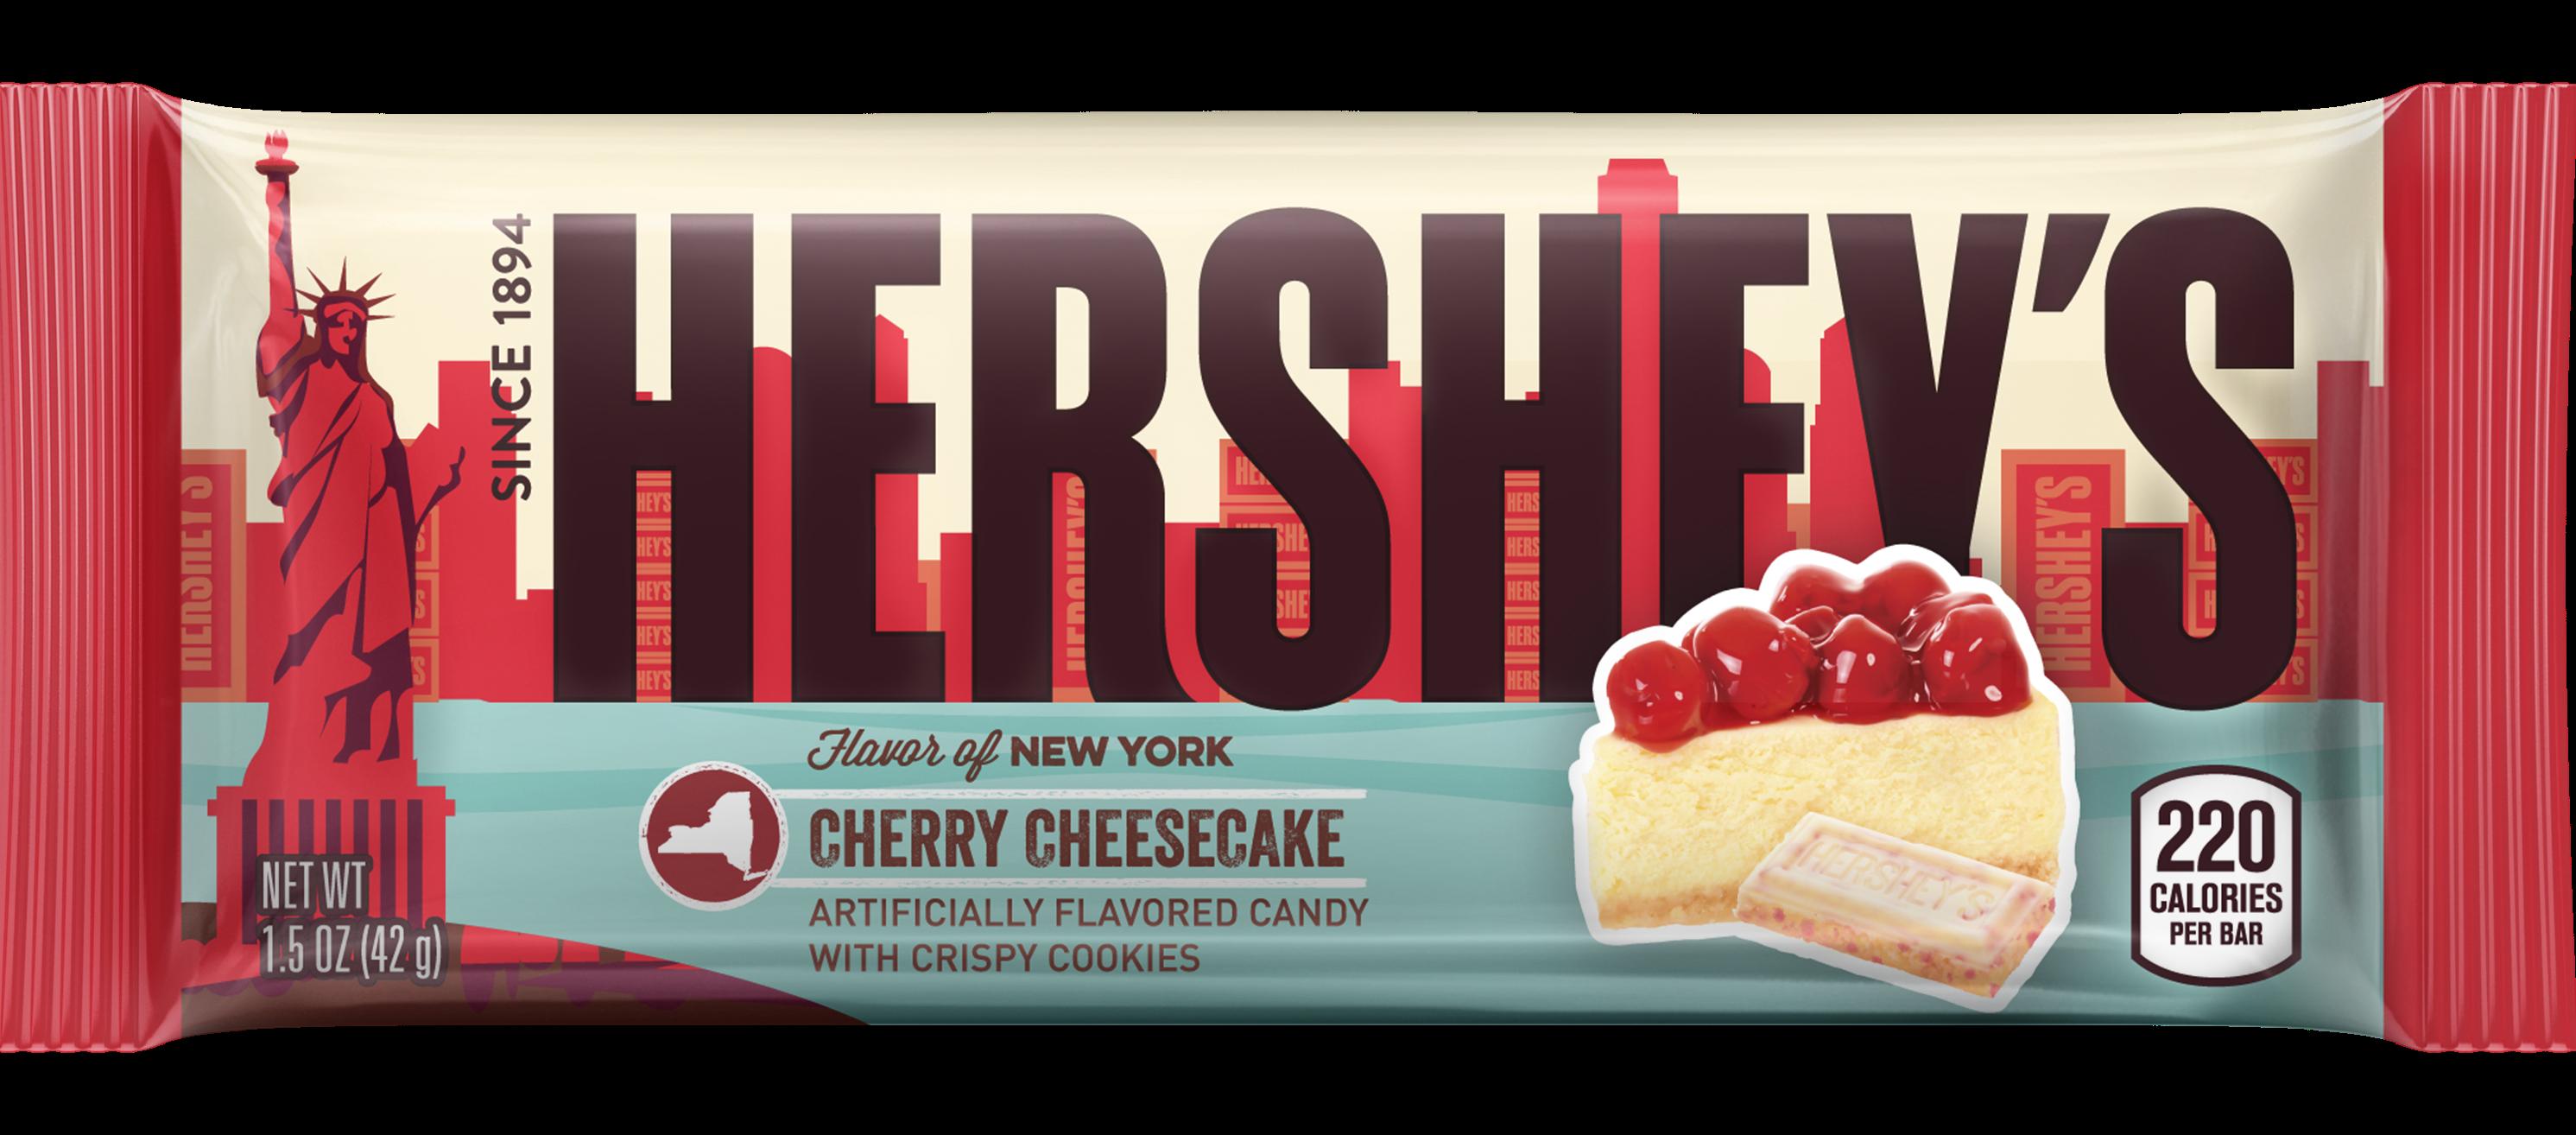 Hersheys-Cherry-Cheesecake-Flavor-of-New-York1.png